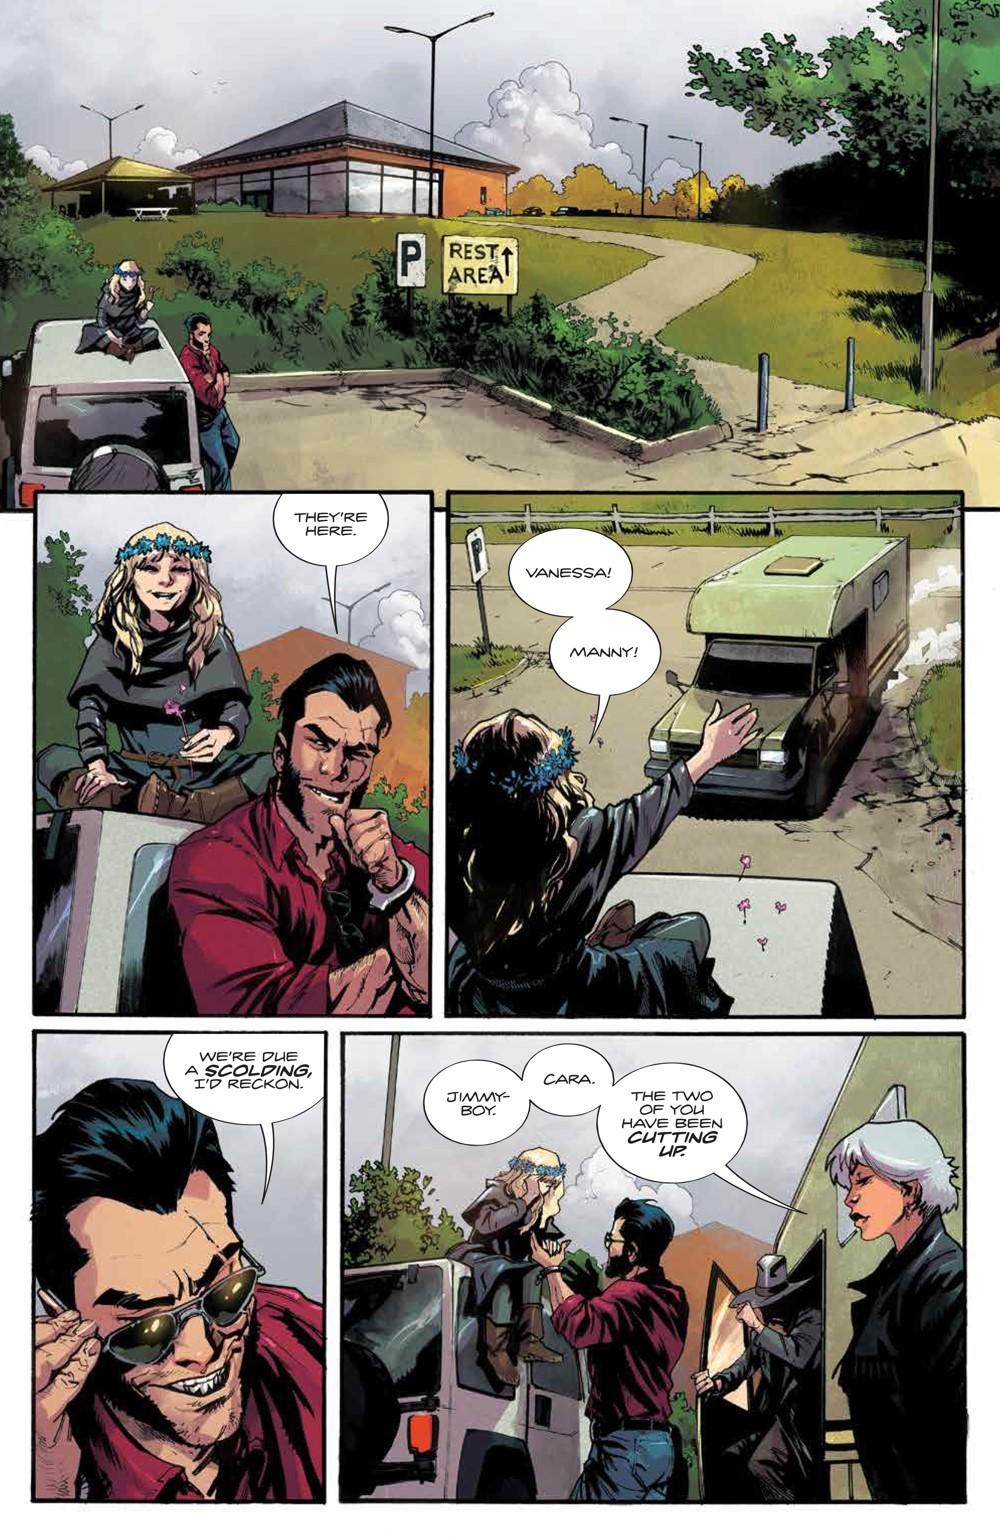 Basilisk_003_PRESS_8 ComicList Previews: BASILISK #3